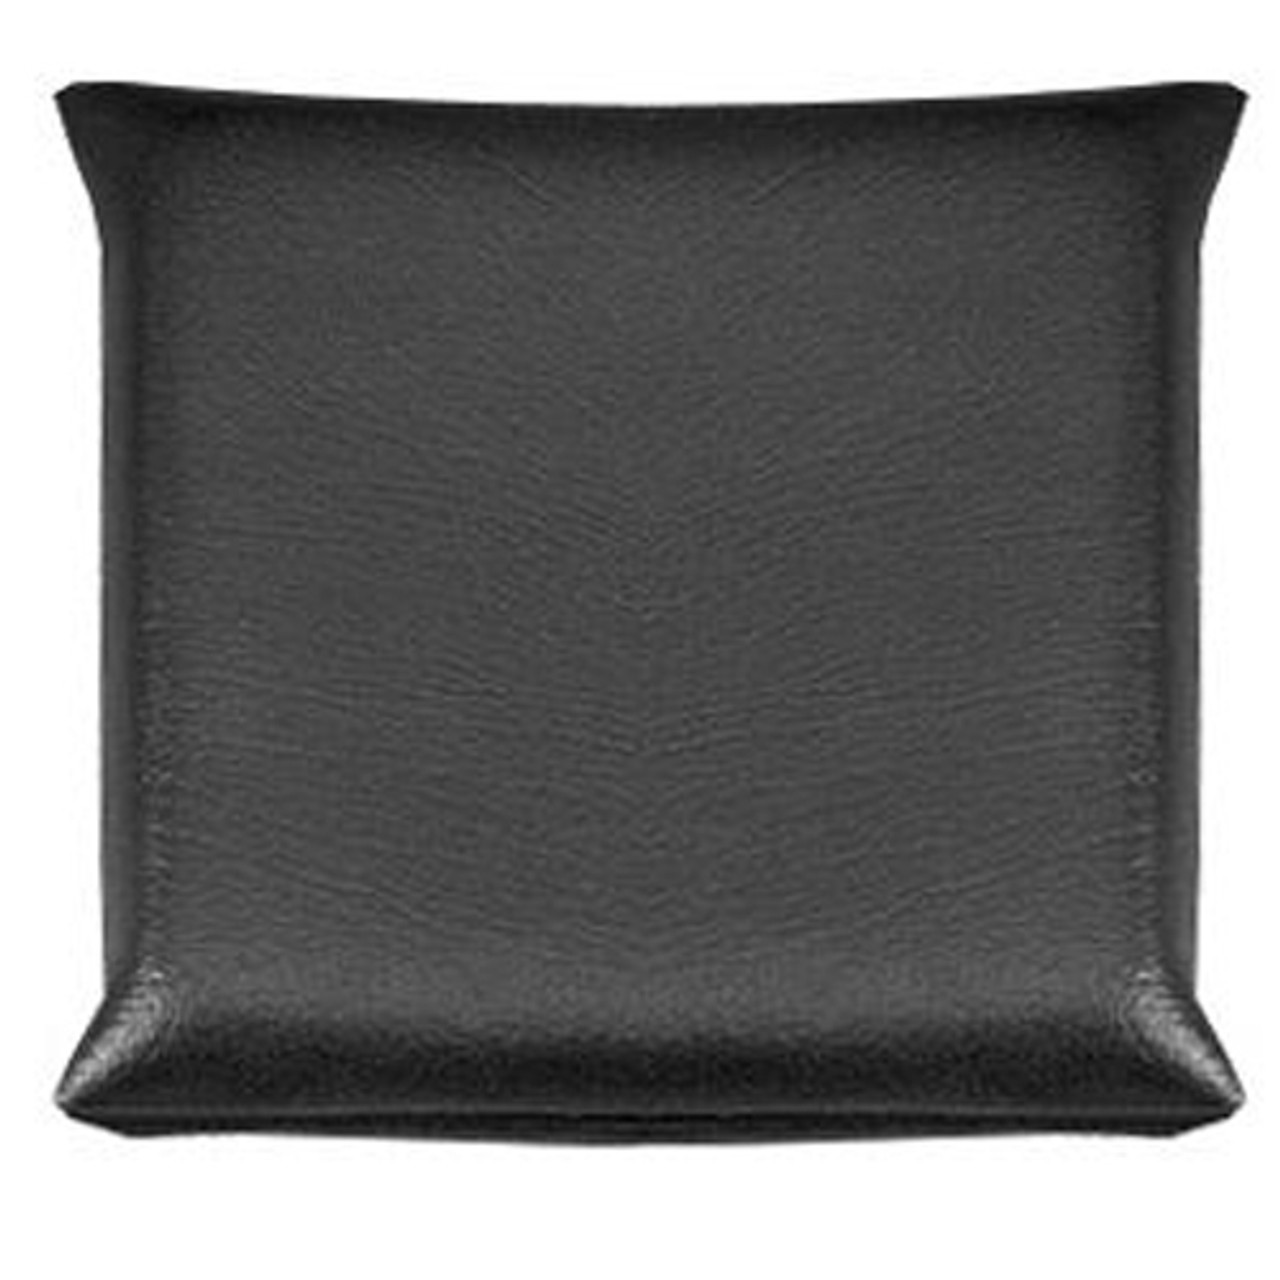 Alignment Pillow, Standard (Black) - Refurbished